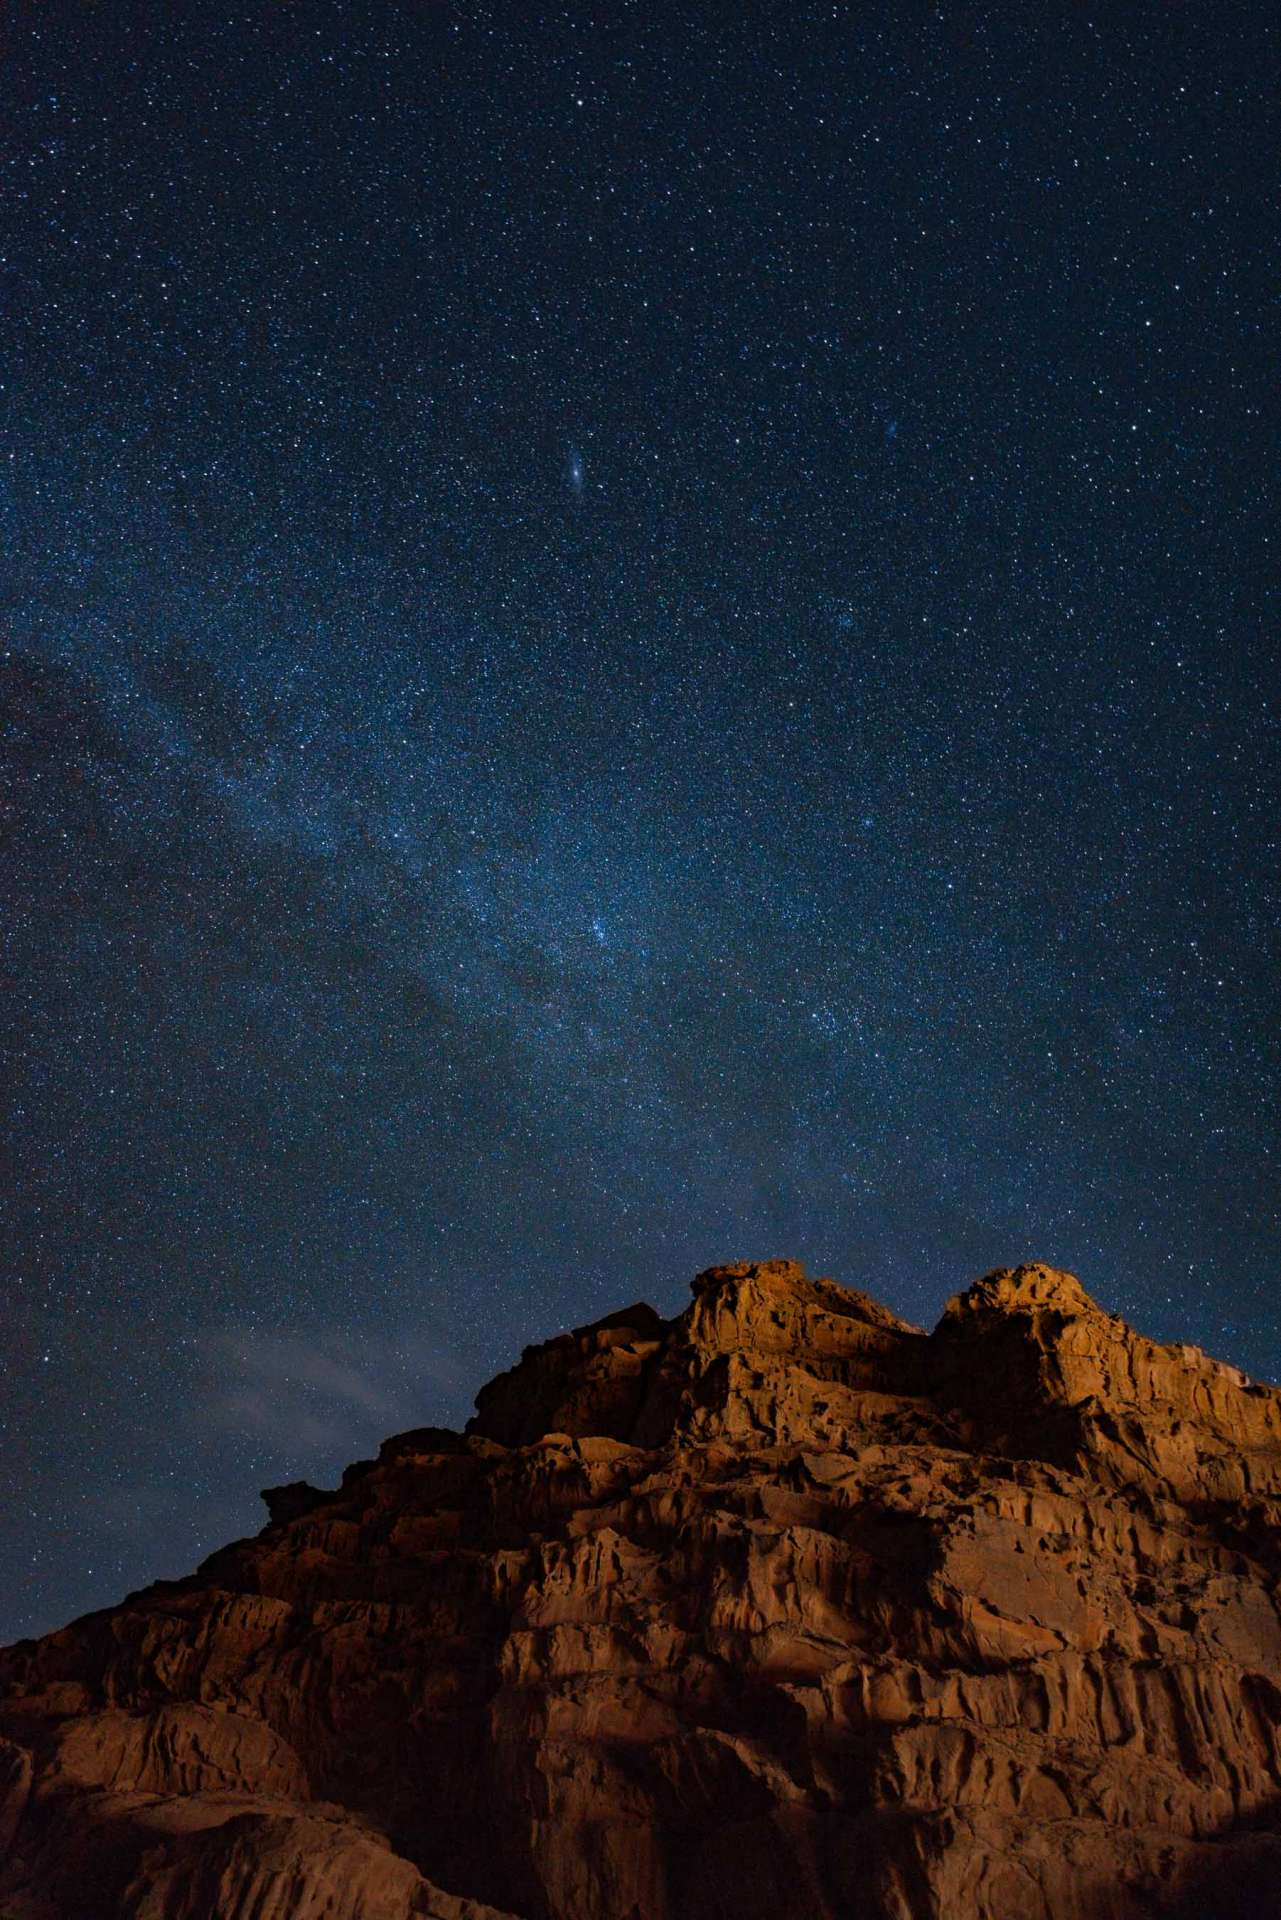 Wadi Rum Night Luxury Camp Full of Stars tent Jordan Enrico Pescantini stargazing stars milky way